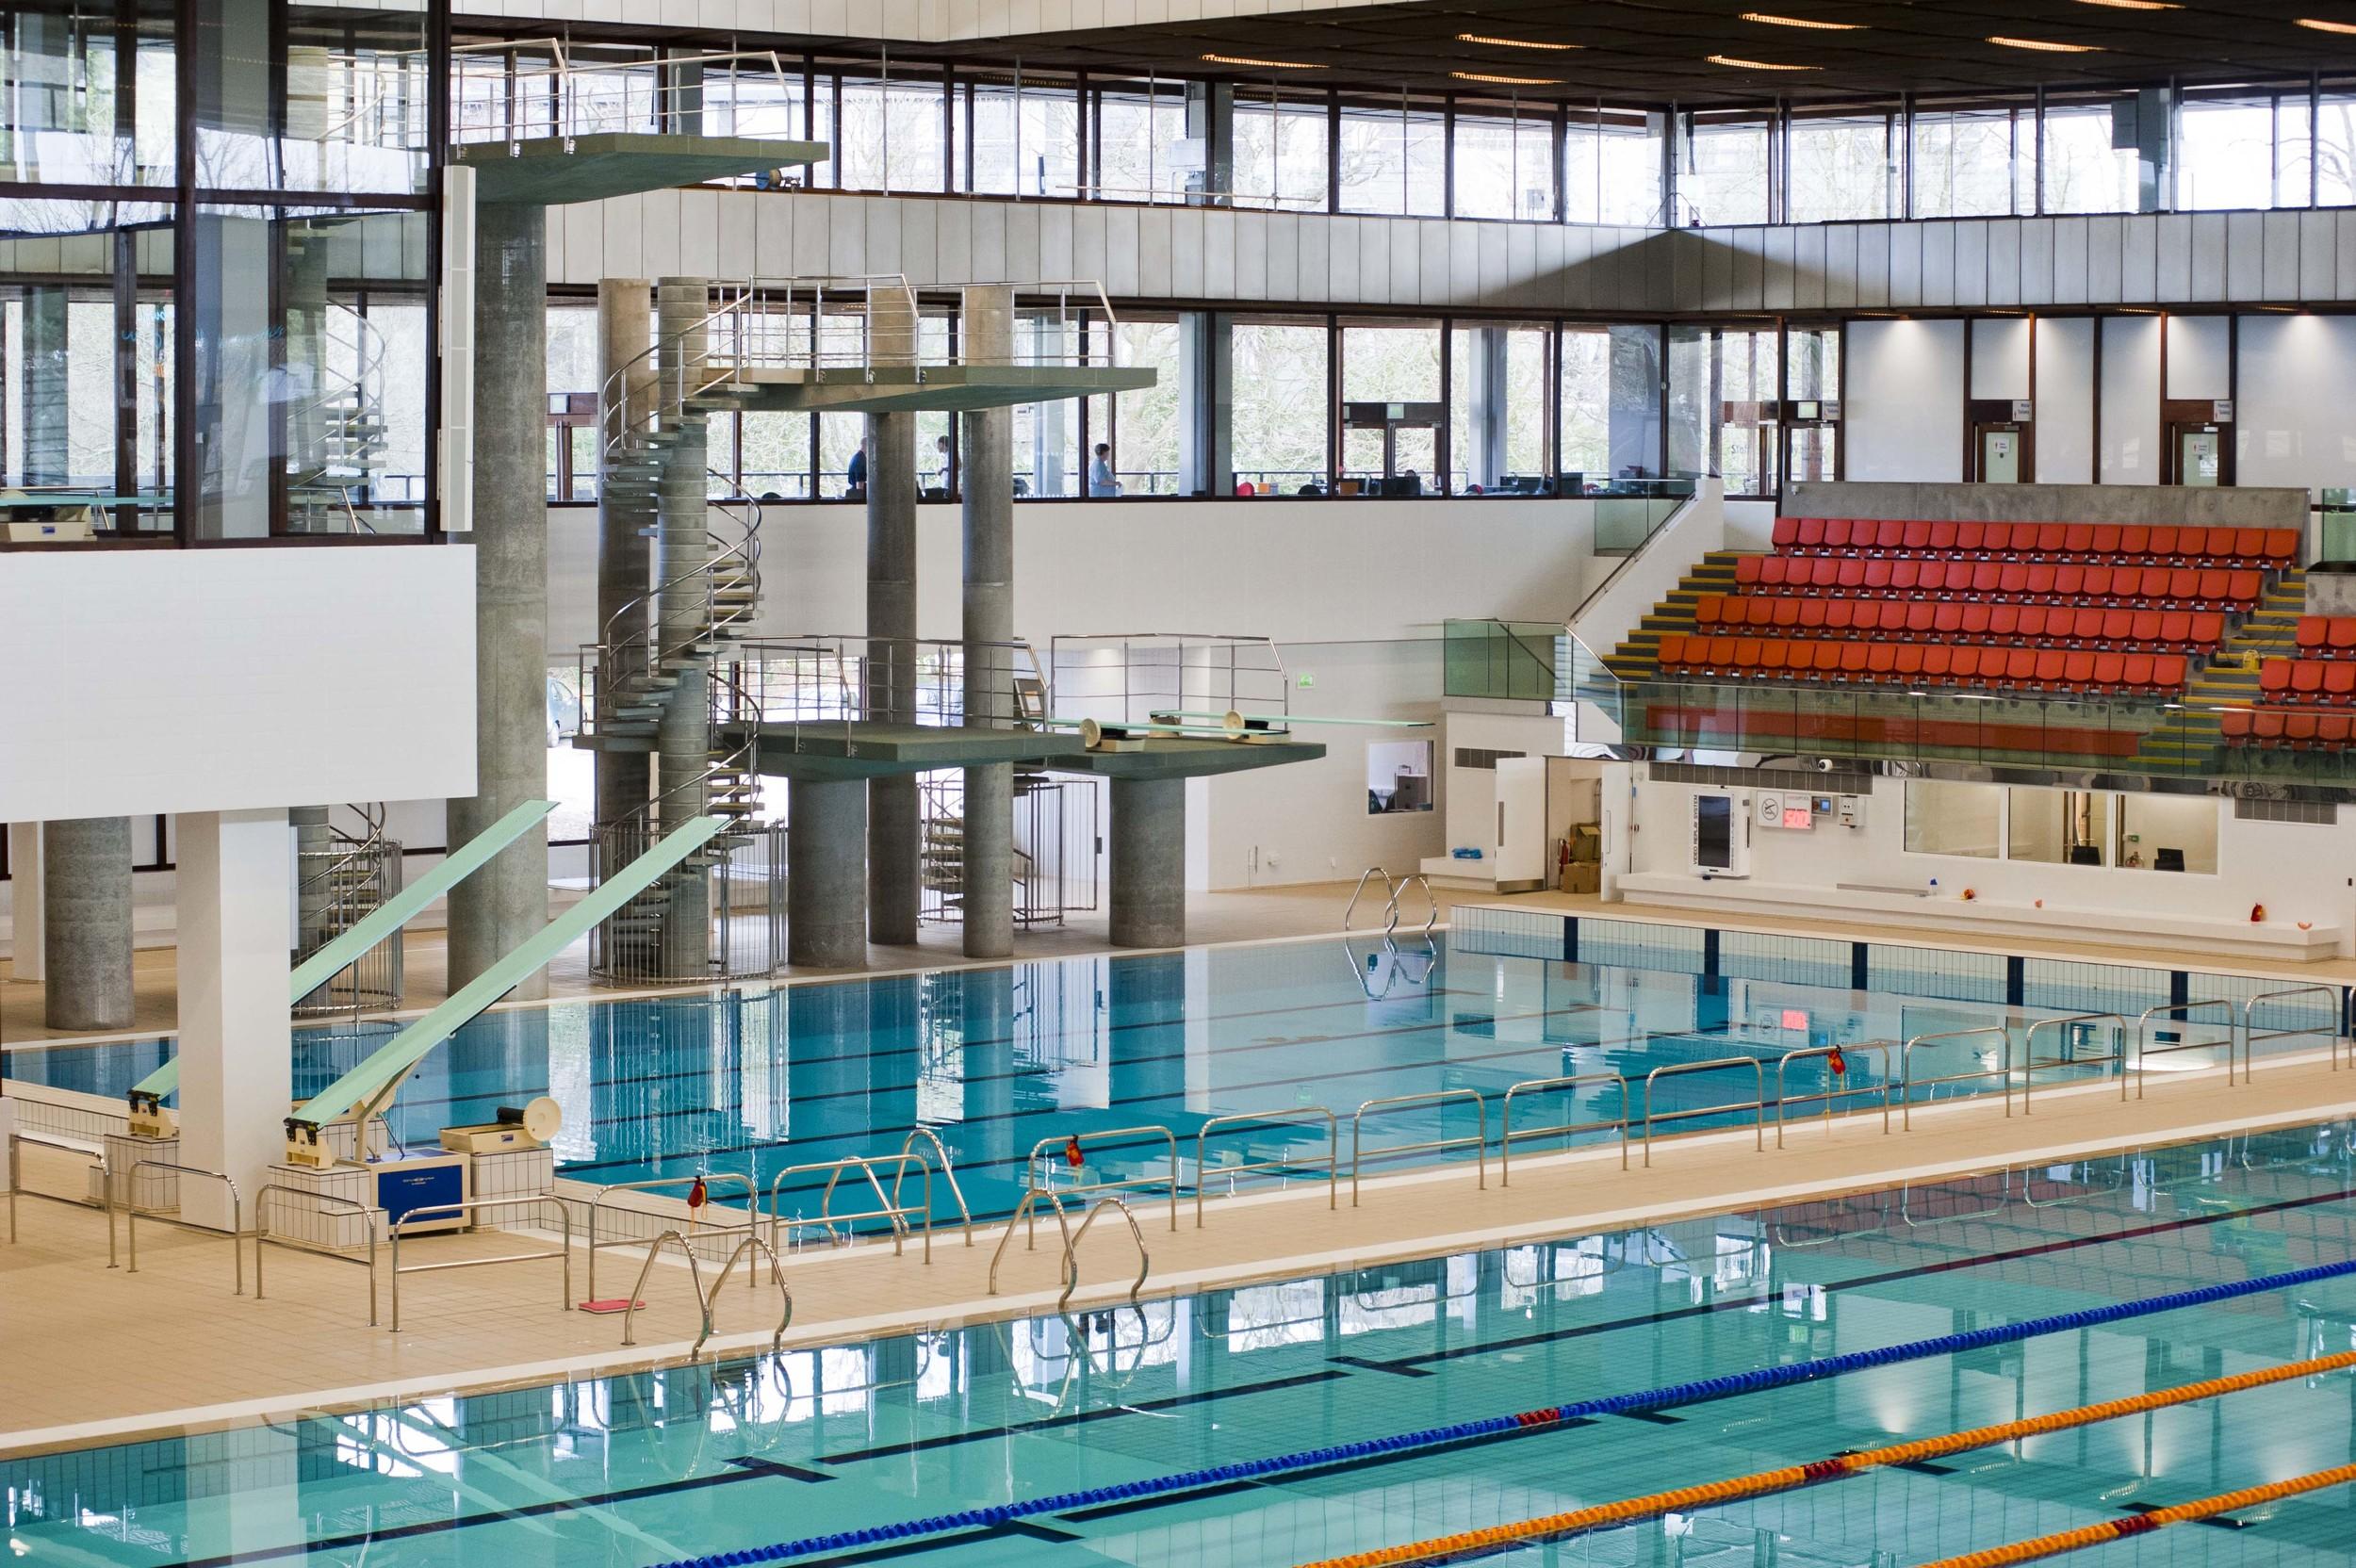 Photo: The Royal Commonwealth Pool